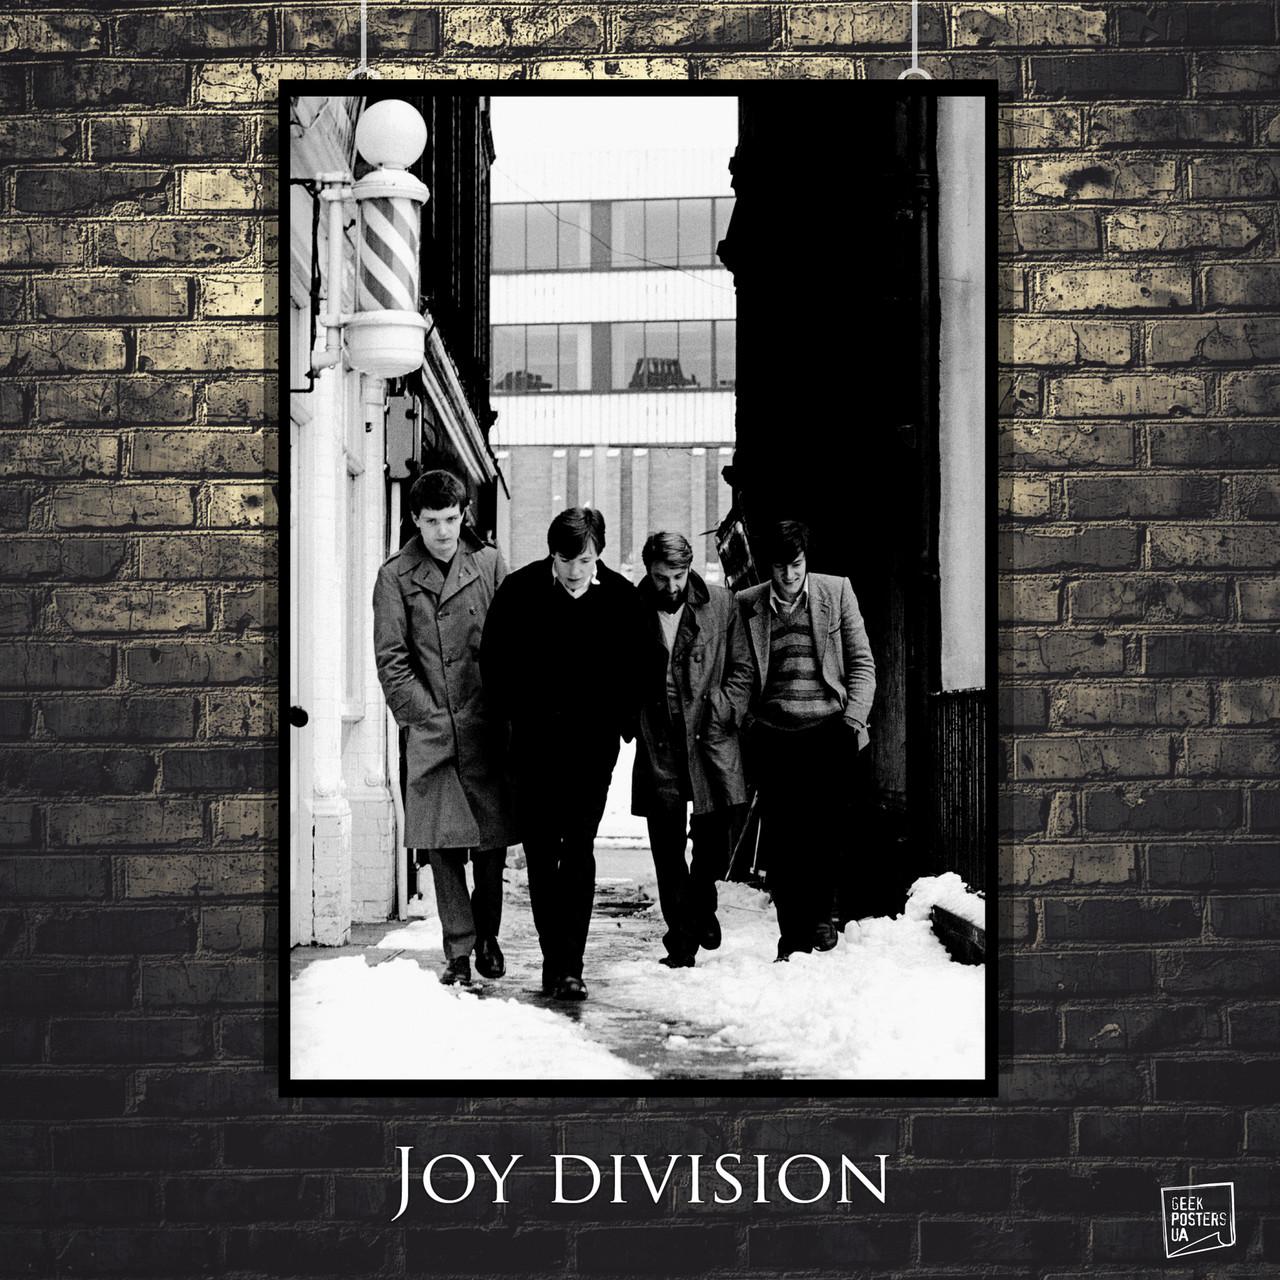 Постер Joy Division, ретрофото, на улице. Размер 60x42см (A2). Глянцевая бумага